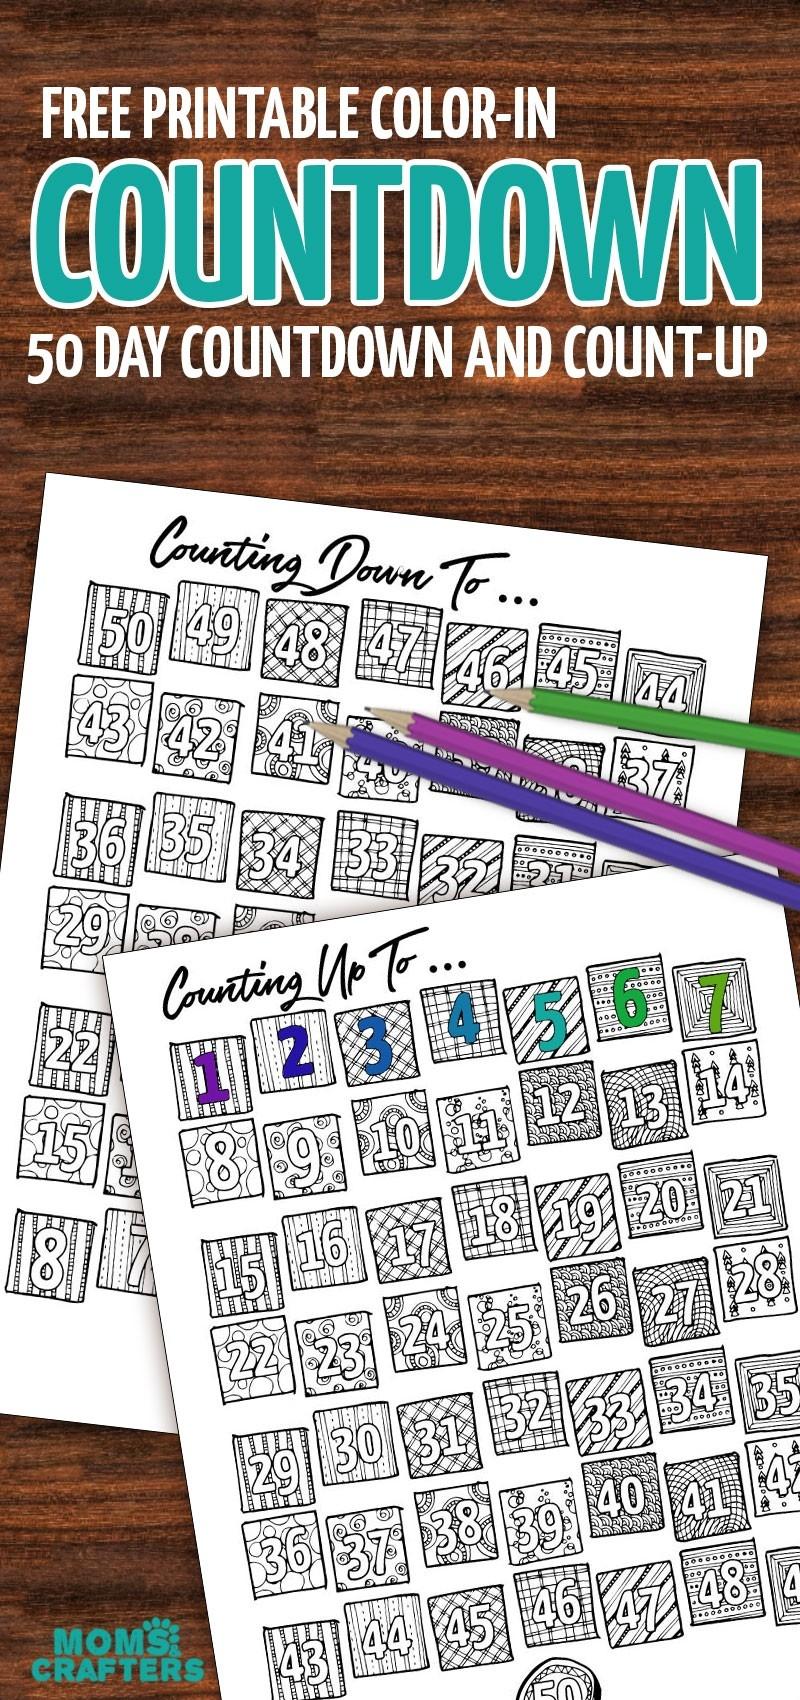 Printable Countdown Calendar And Progress Tracker - Color-In-Printable Holiday Countdown Calendar Template